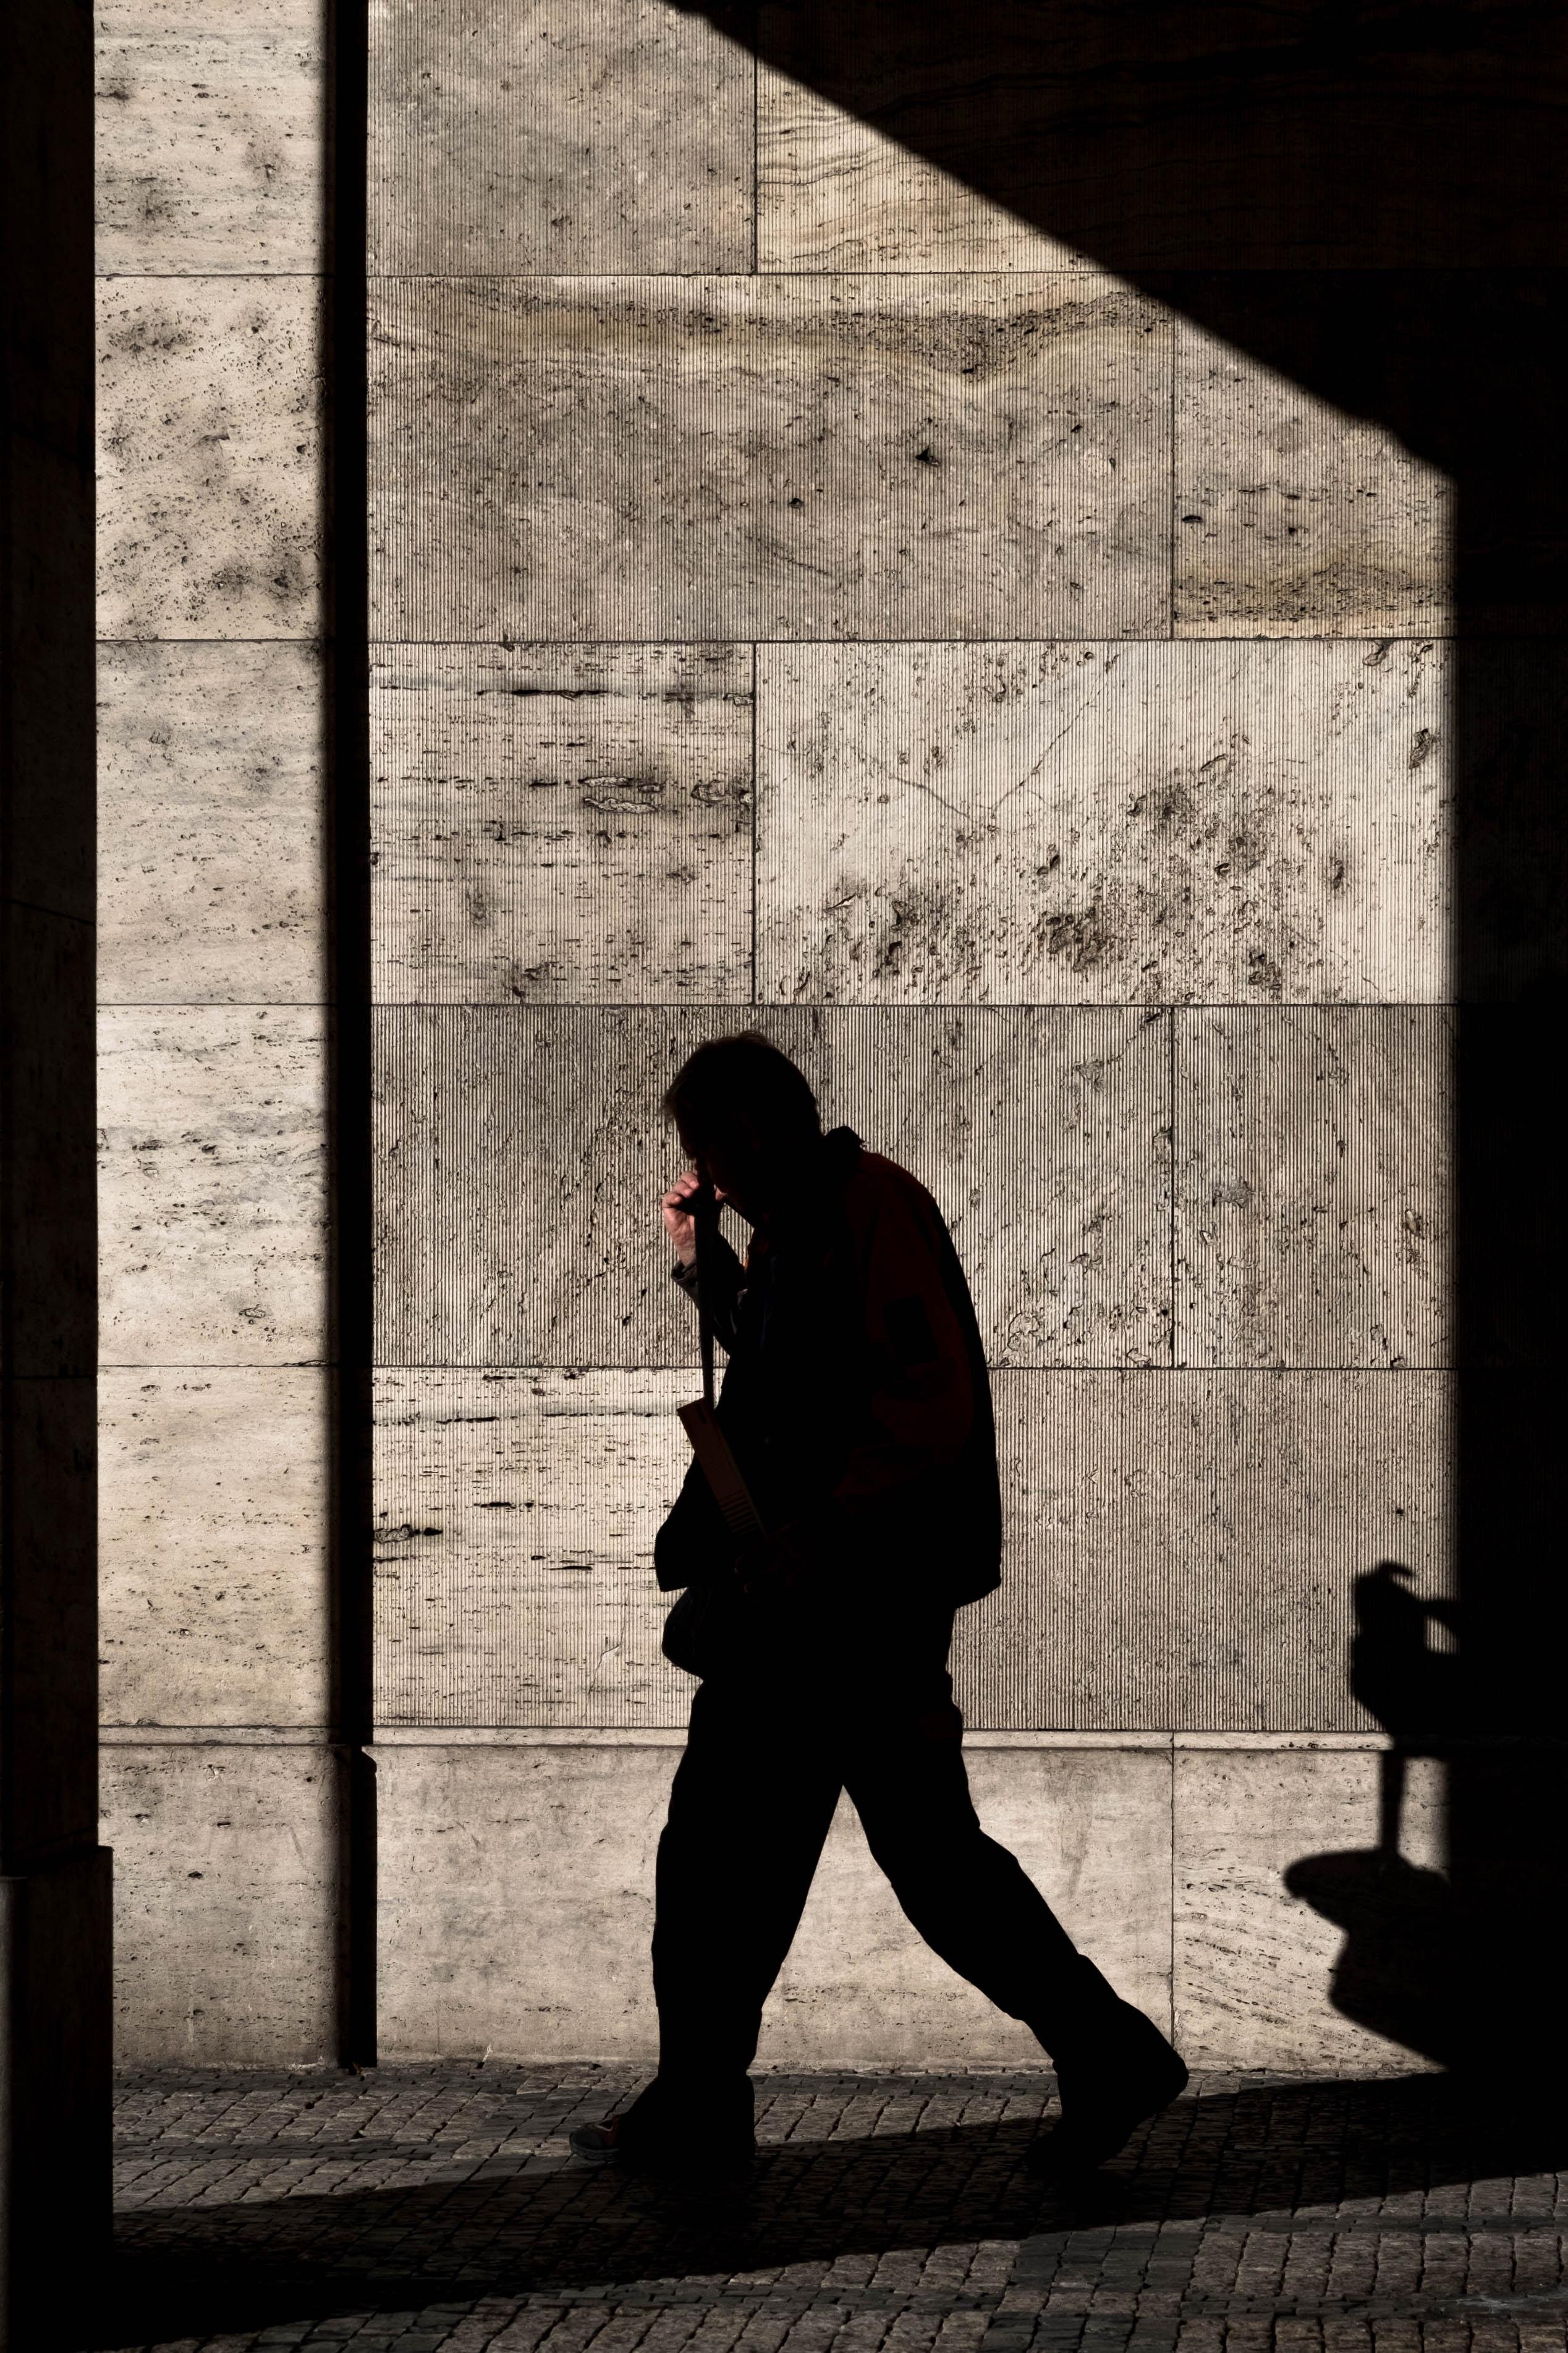 shadow of man walking near wall